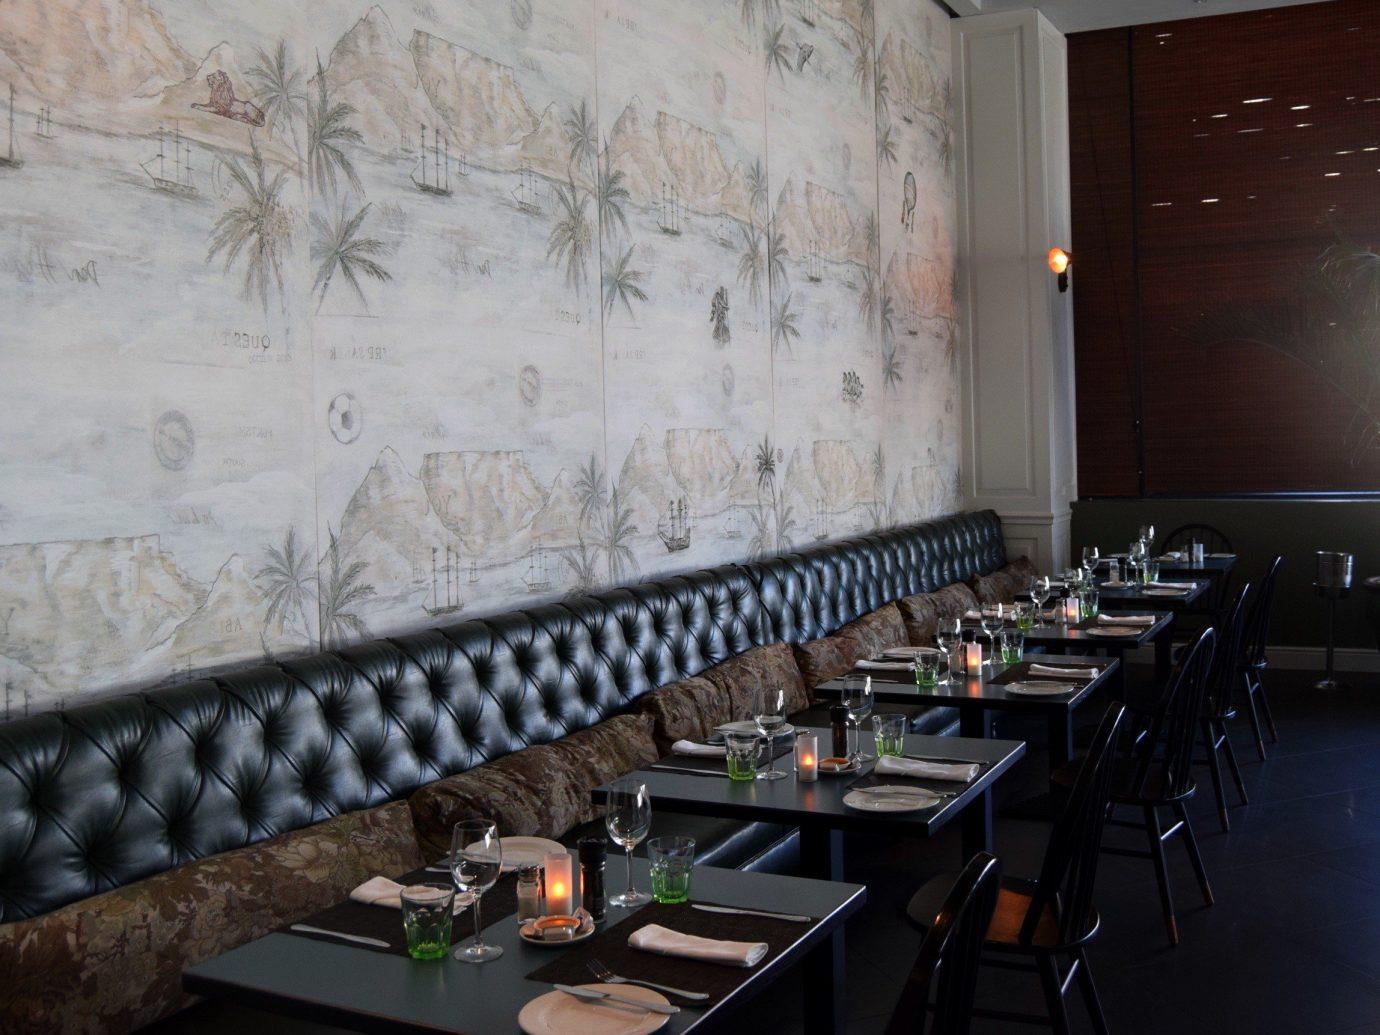 Food + Drink indoor room wall interior design restaurant Design furniture